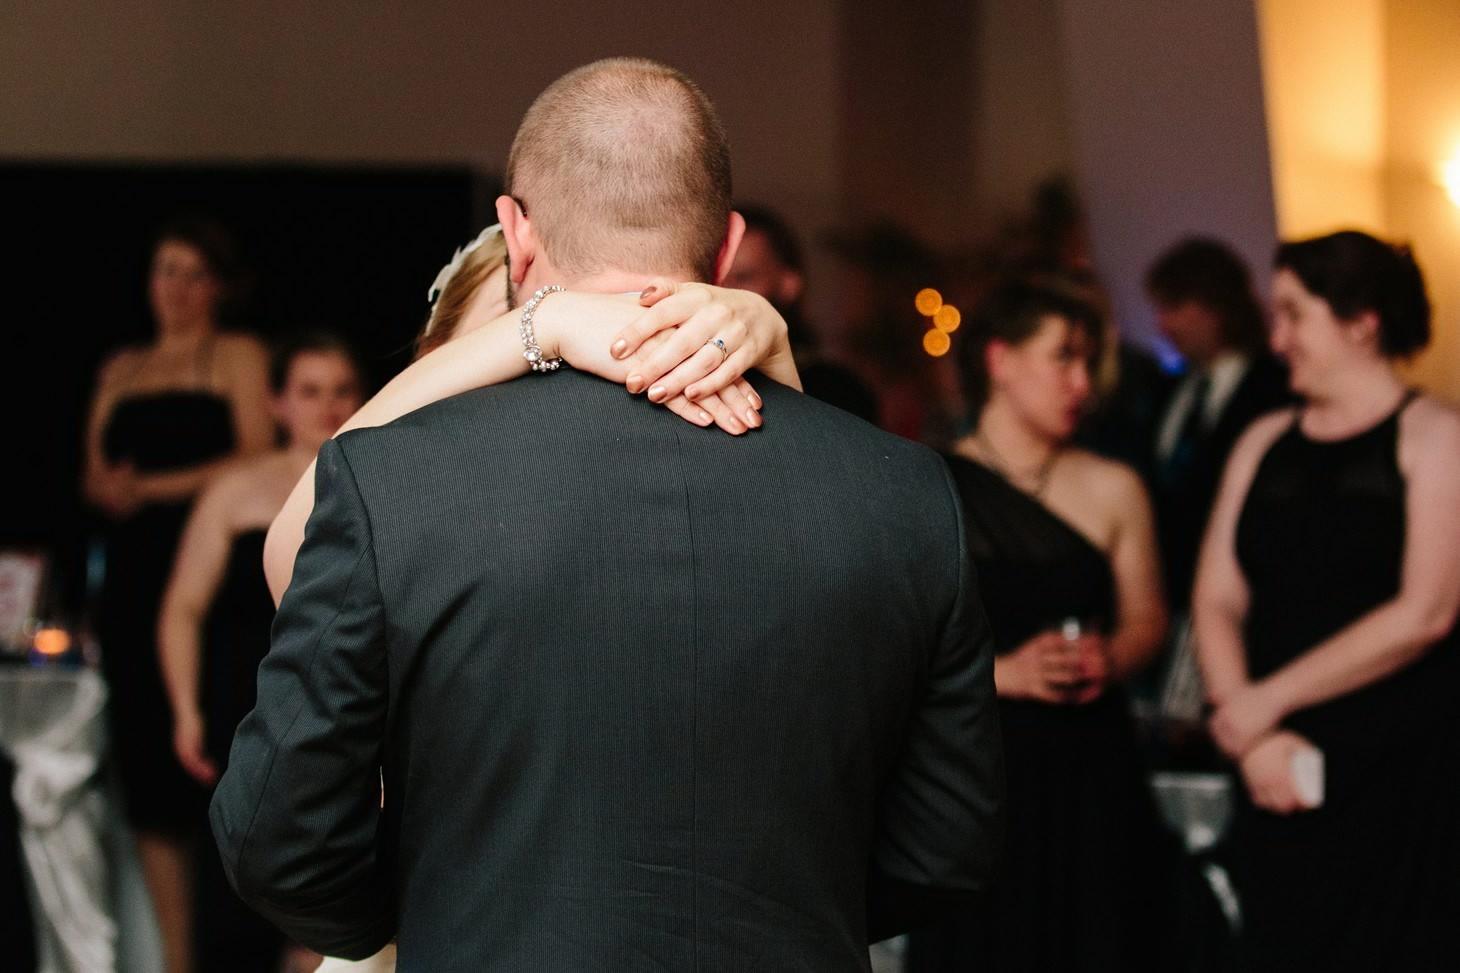 028-nyc-wedding-photographer-nj-nerdy-dr-who-firehouse-wedding-smitten-chickens.jpg